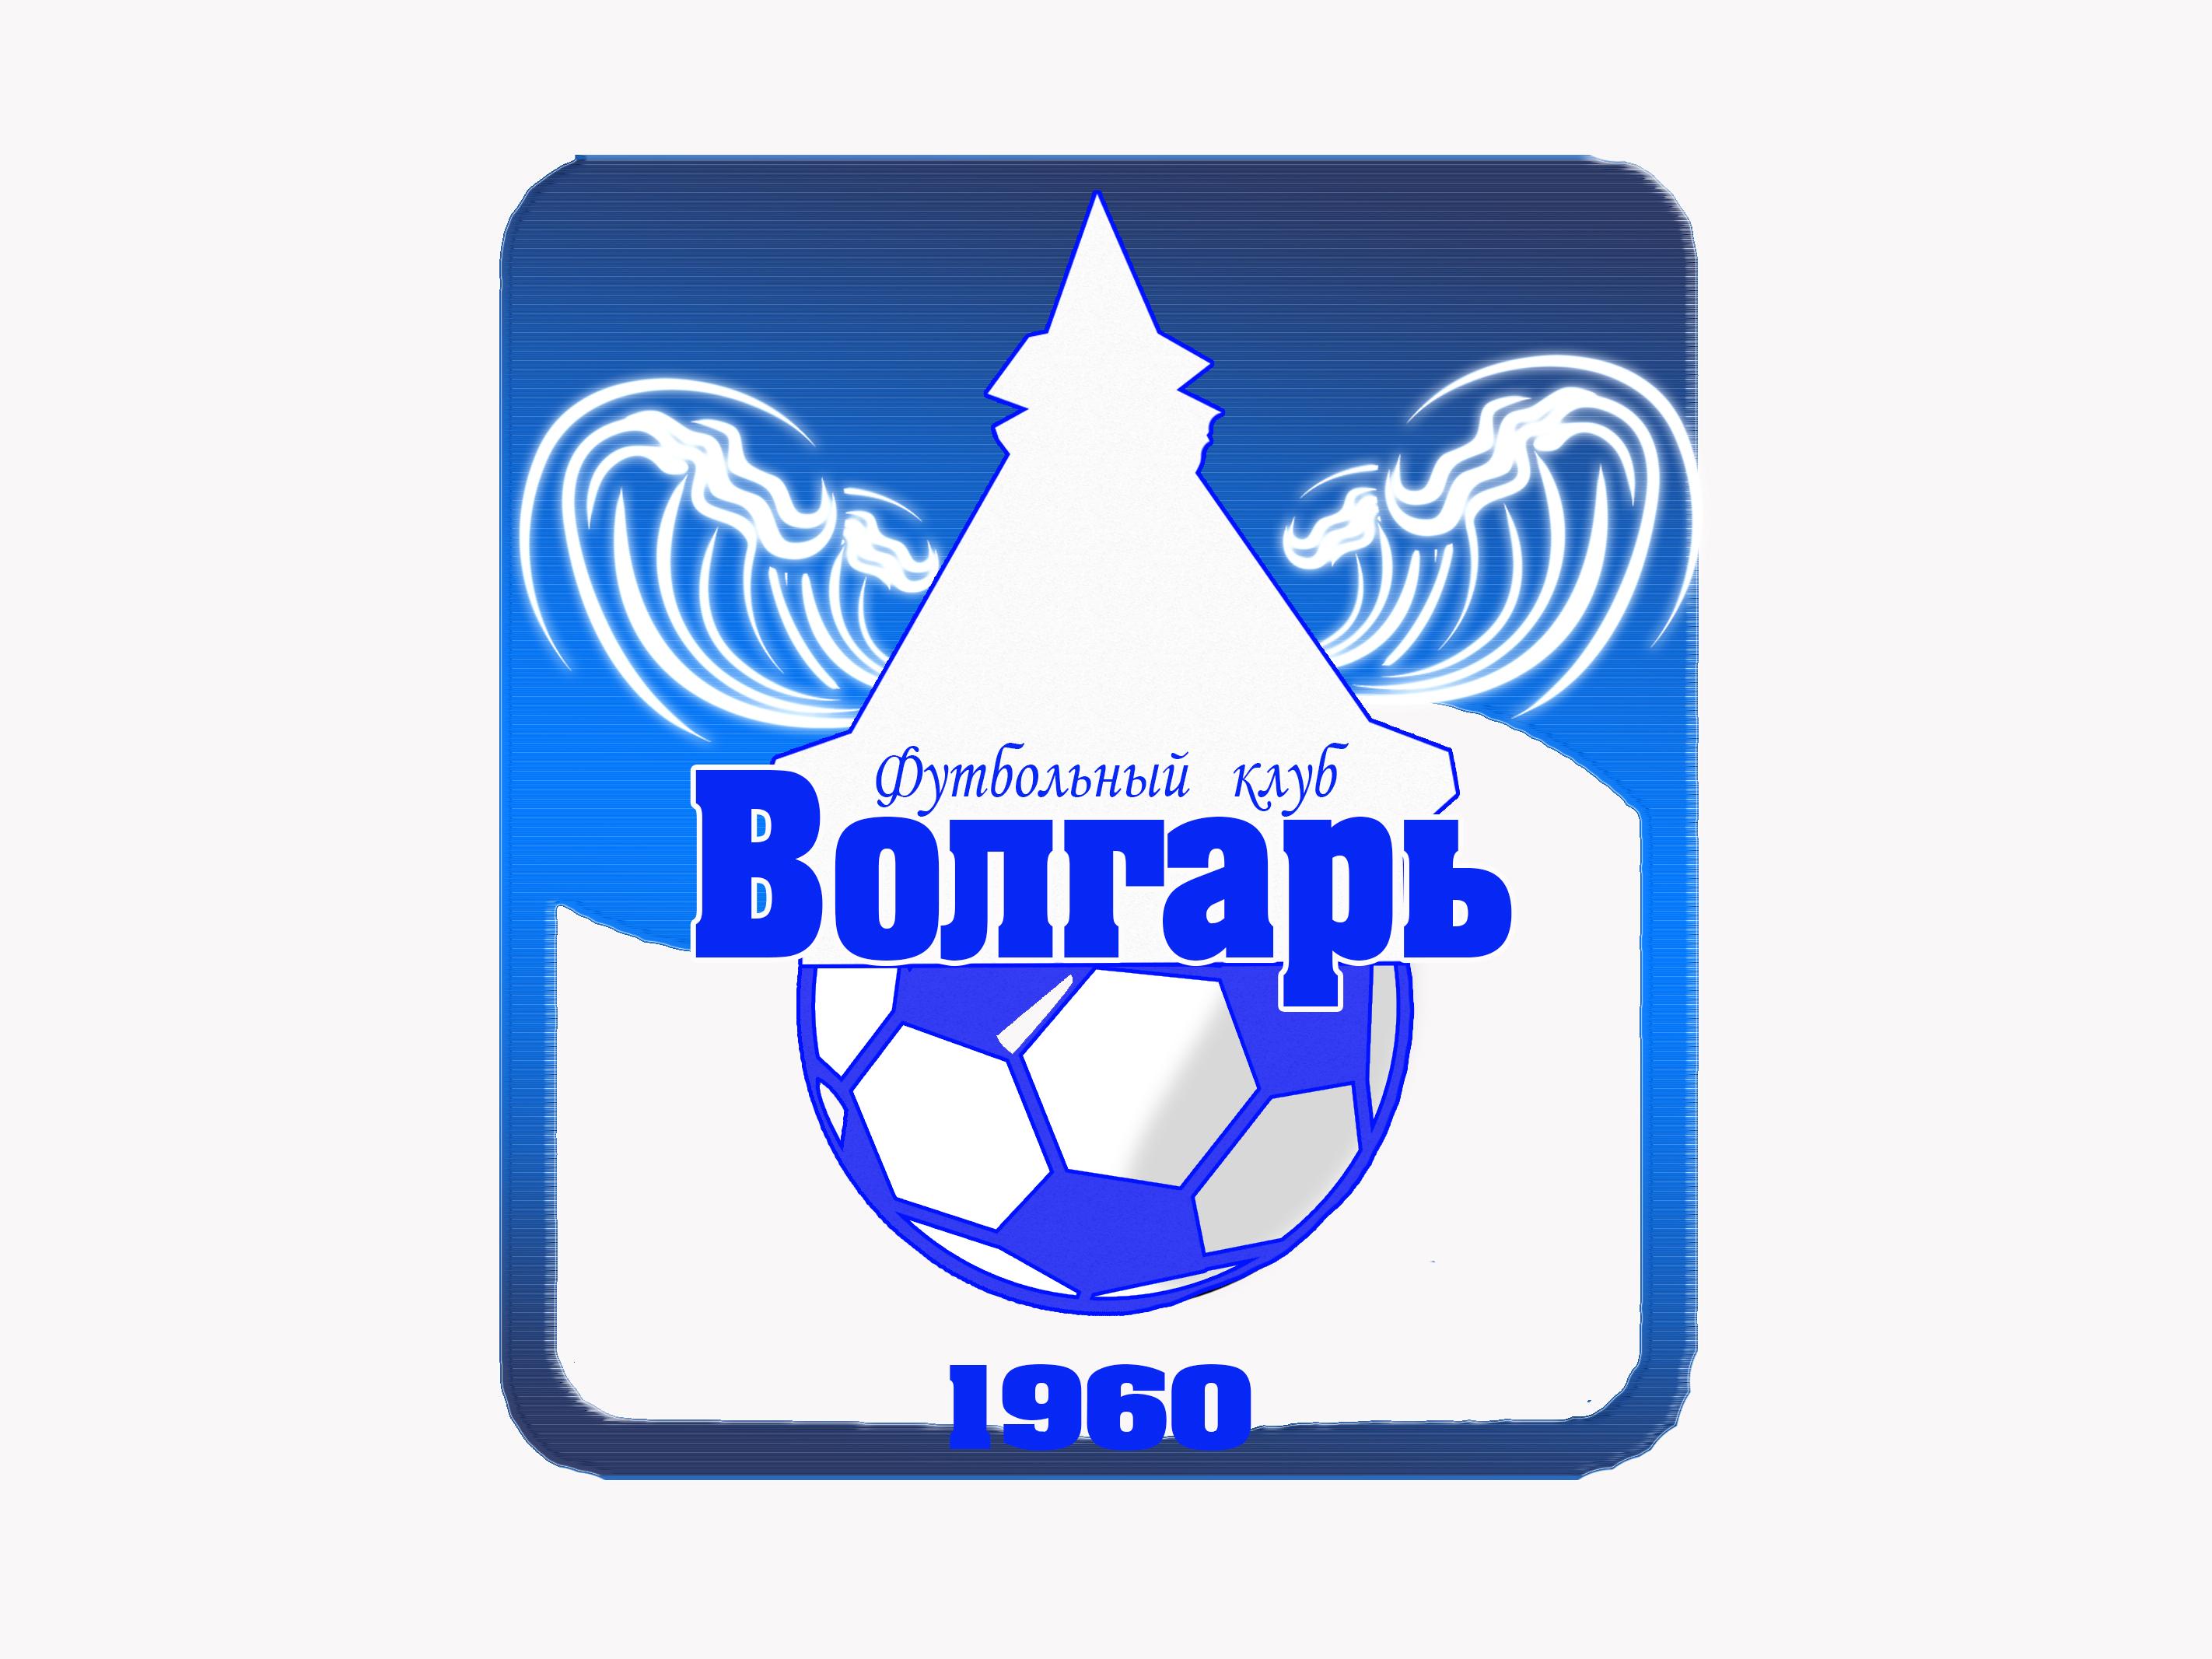 Разработка эмблемы футбольного клуба фото f_4fbfa6e5f23b1.jpg